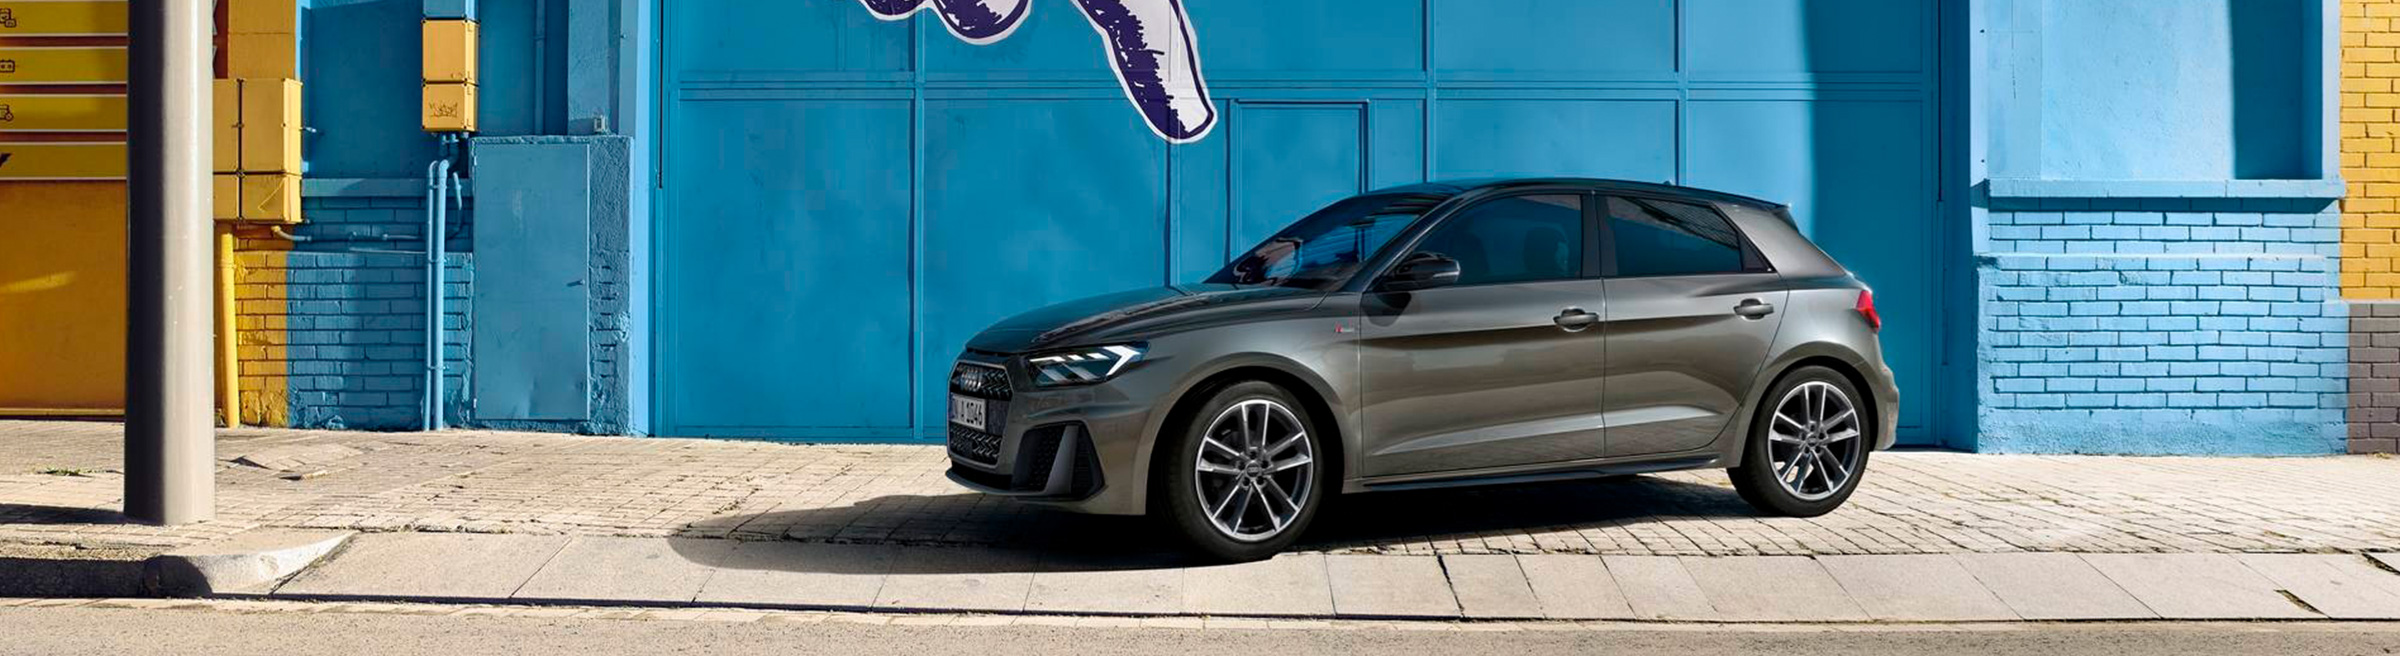 Nya Audi A1 sidan grå